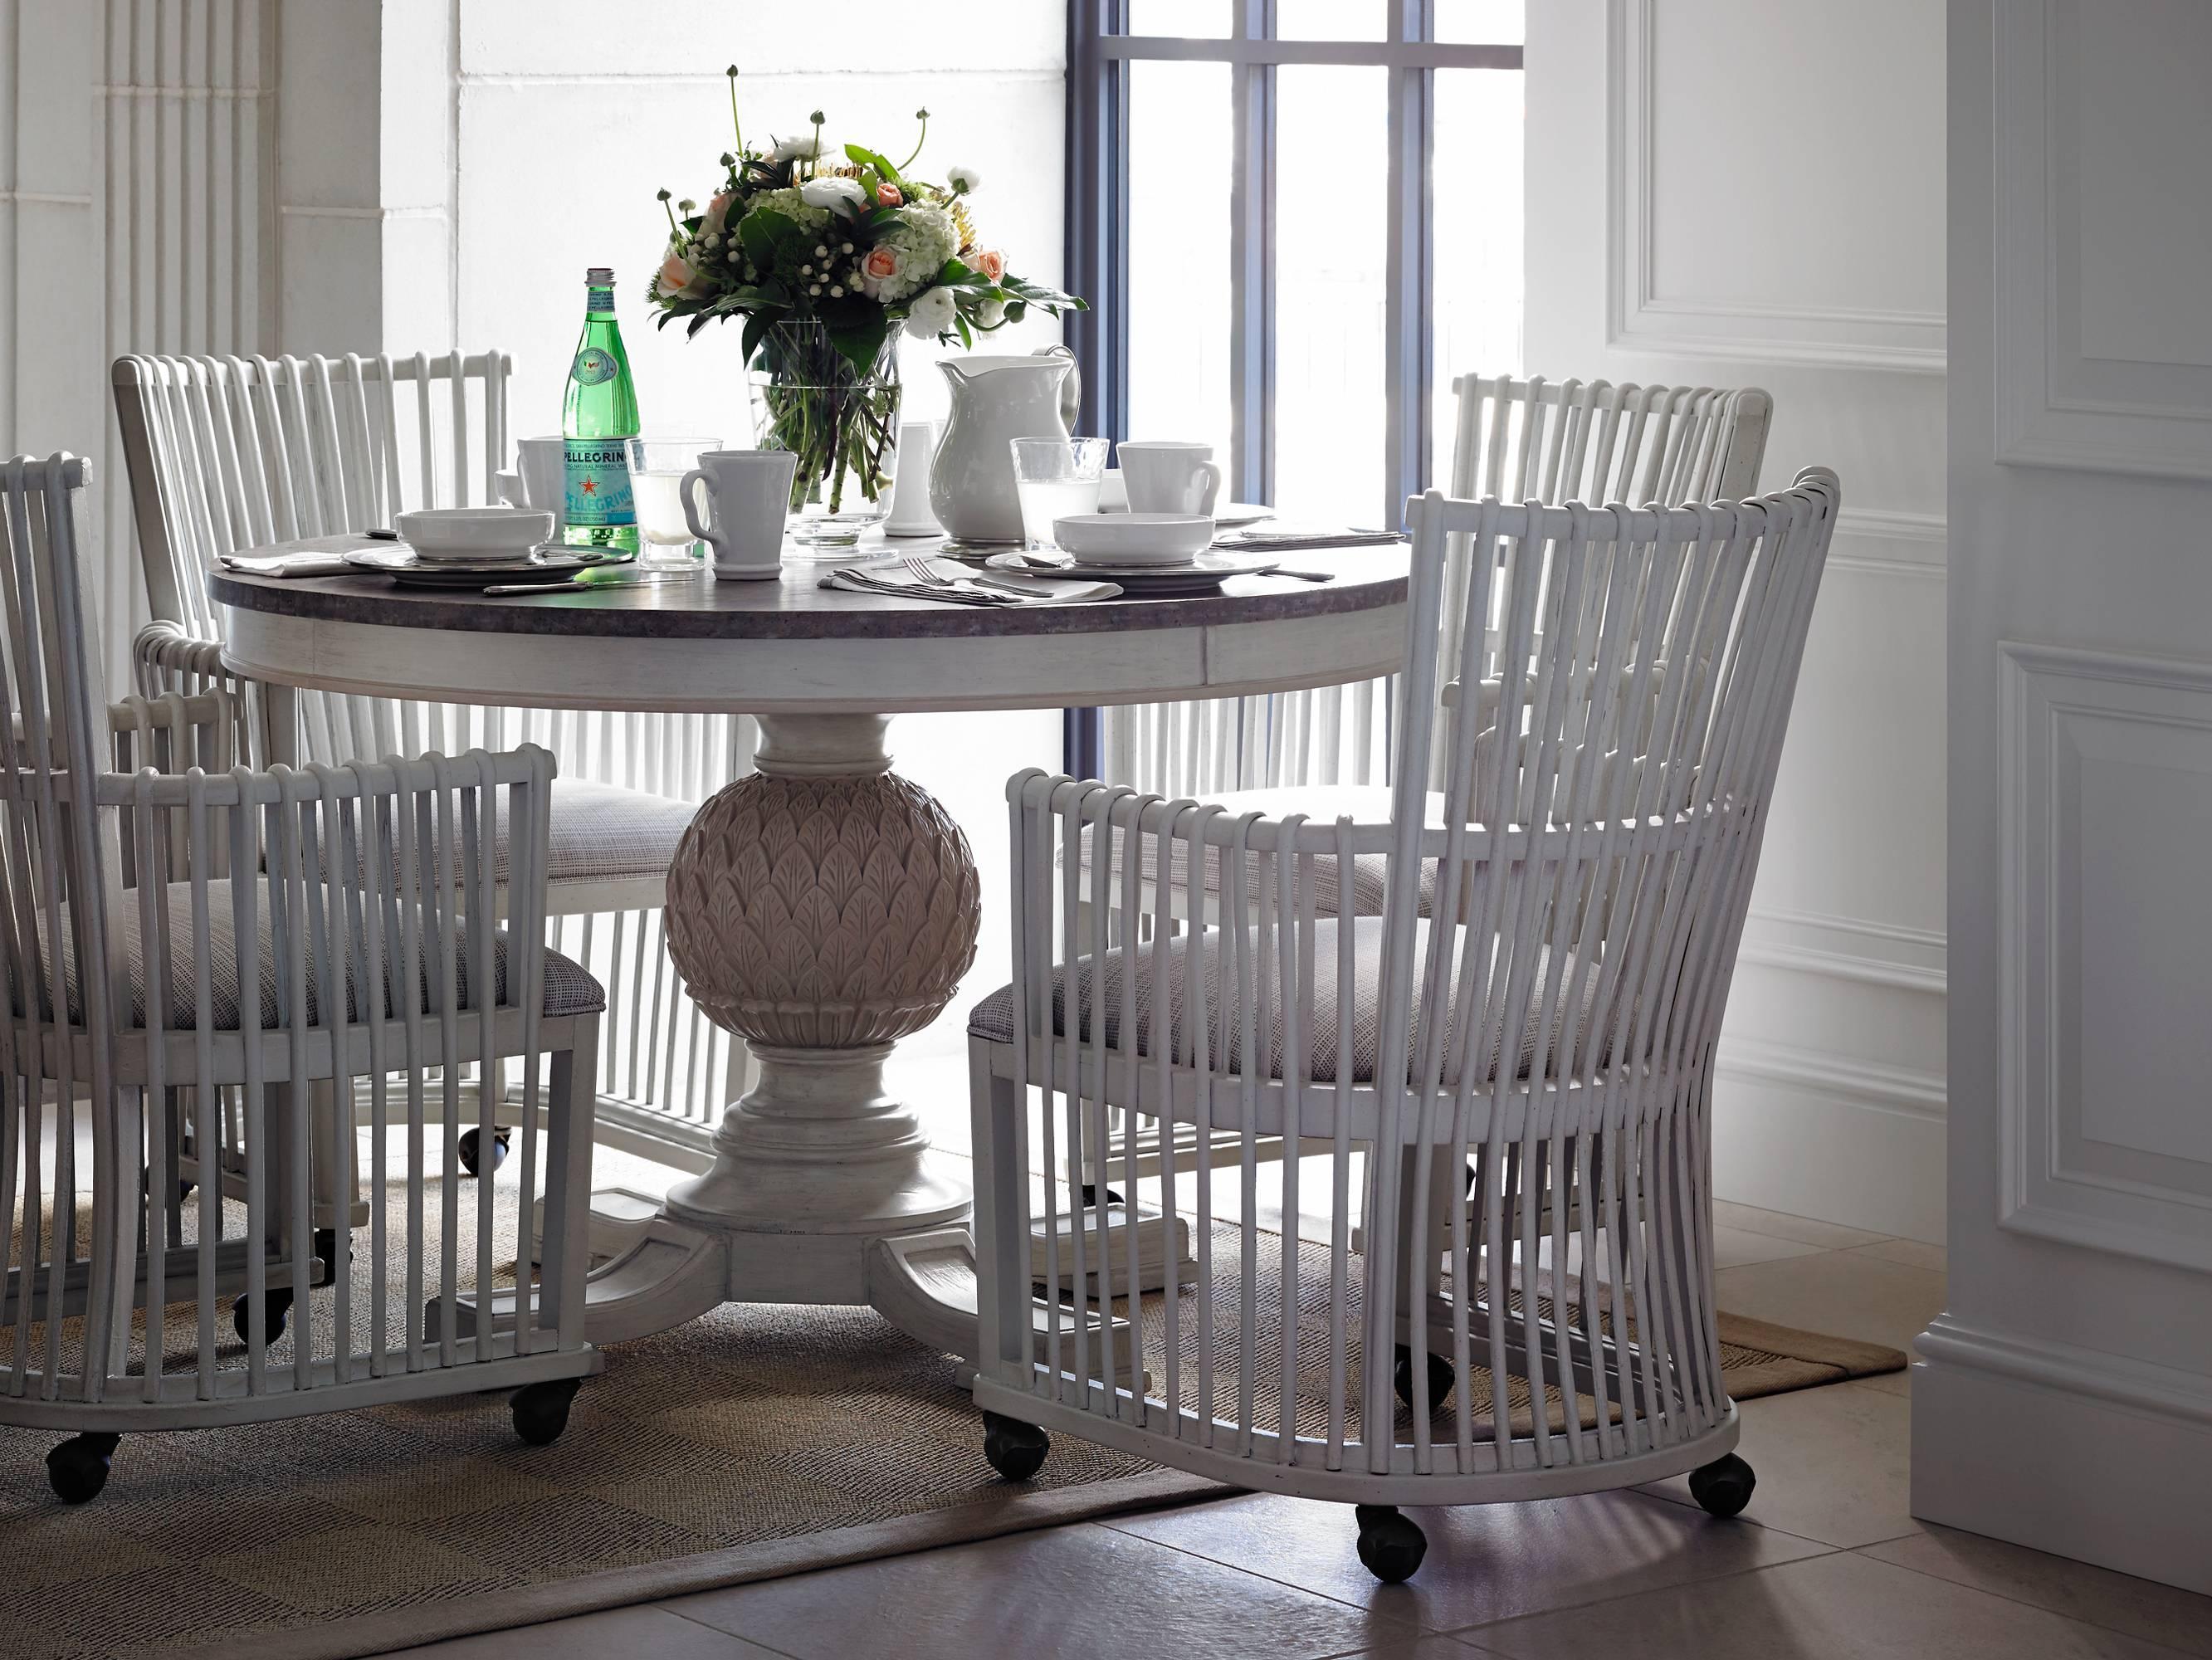 Stanley Furniture Preserve 340 21 30 Artichoke Pedestal